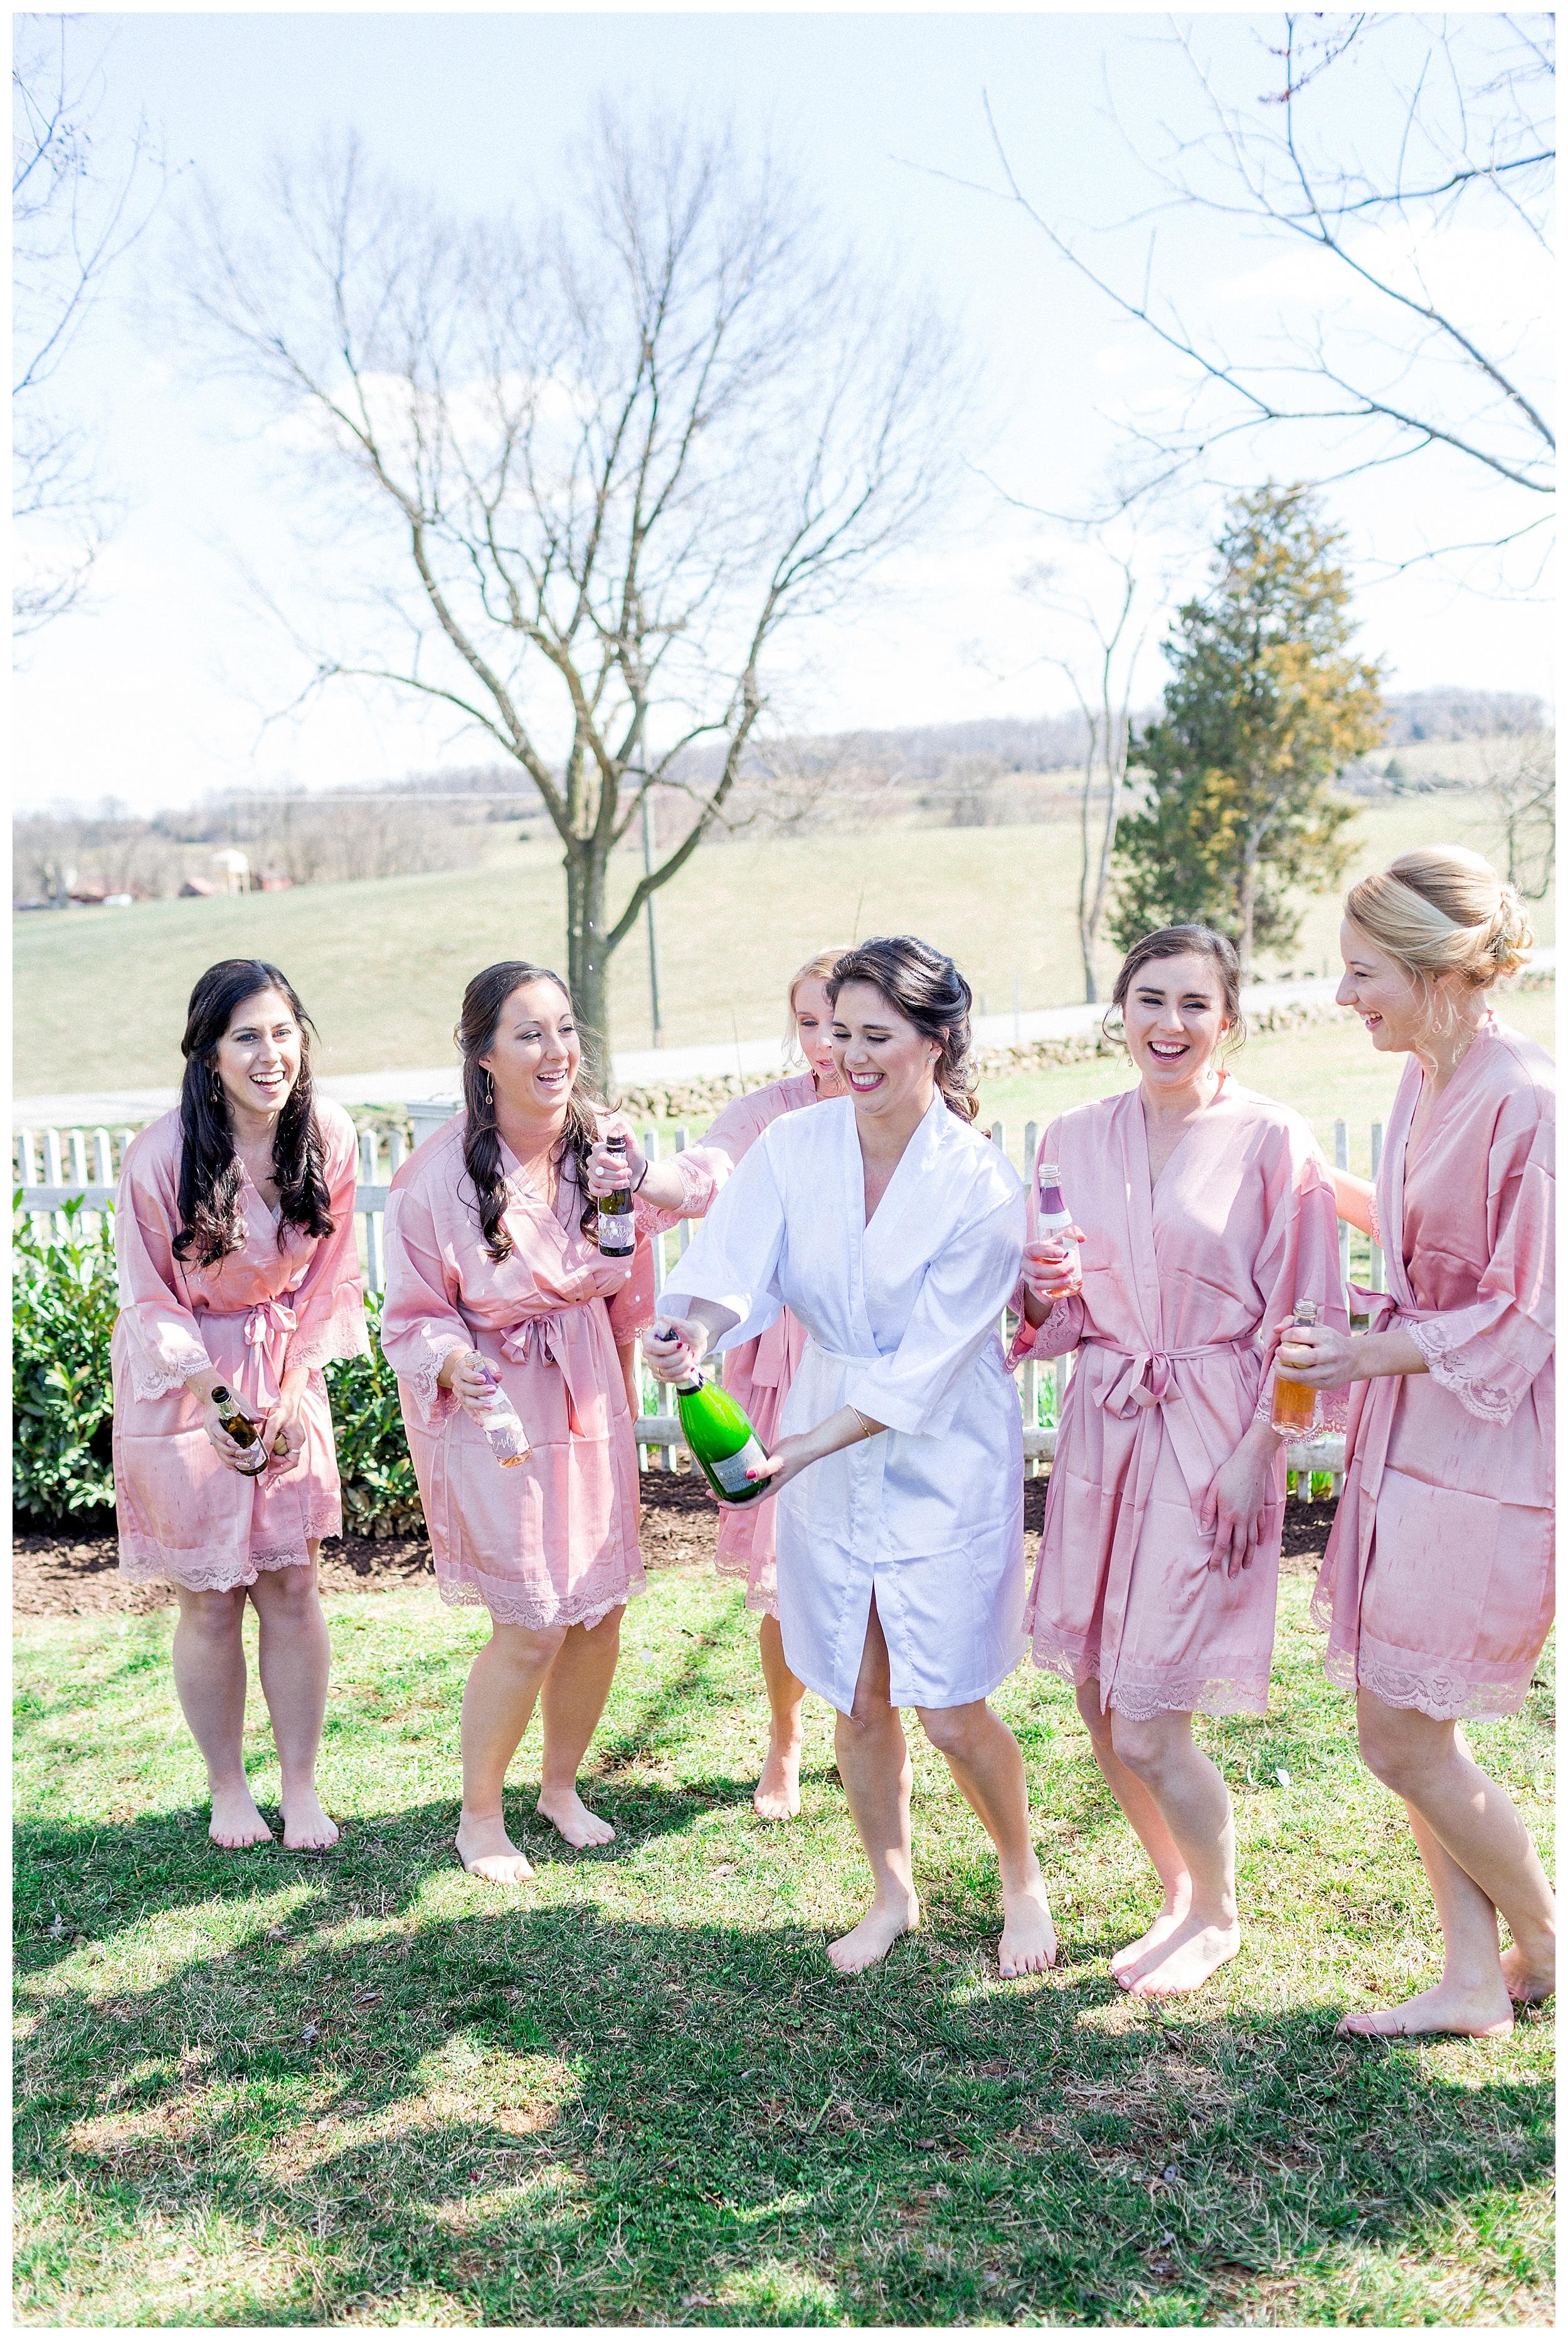 Stone Tower Winery Wedding | Virginia Winter Wedding | VA Wedding Photographer Kir Tuben_0011.jpg